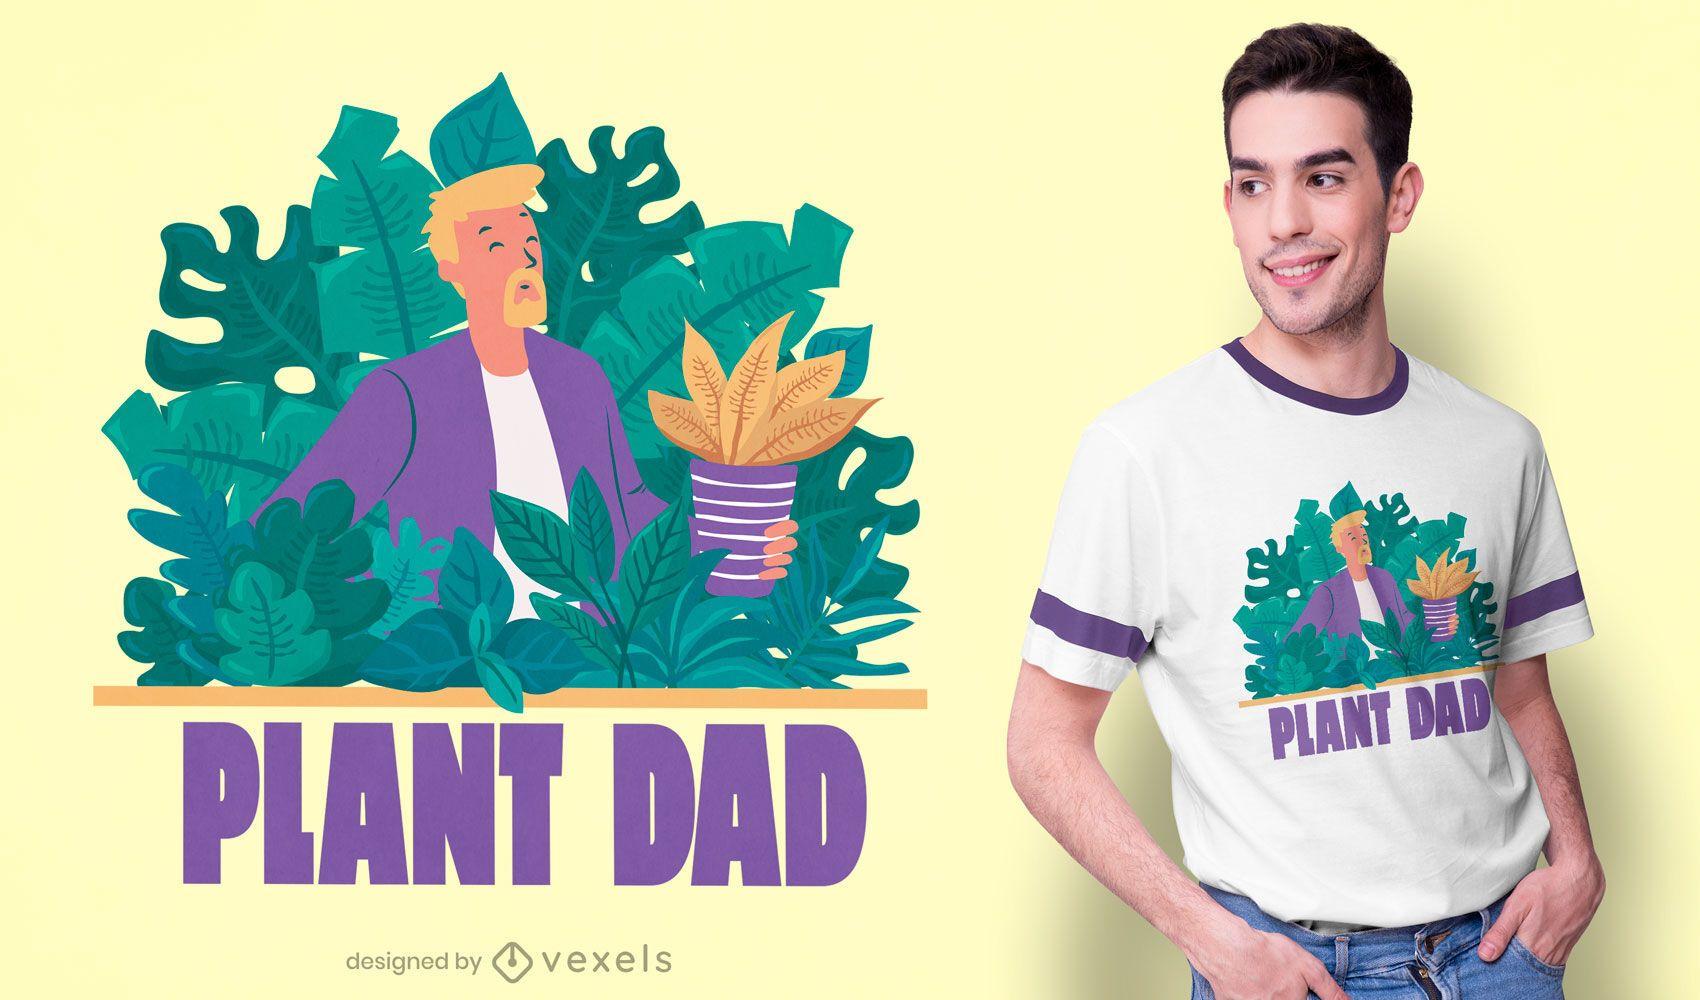 Plant dad t-shirt design